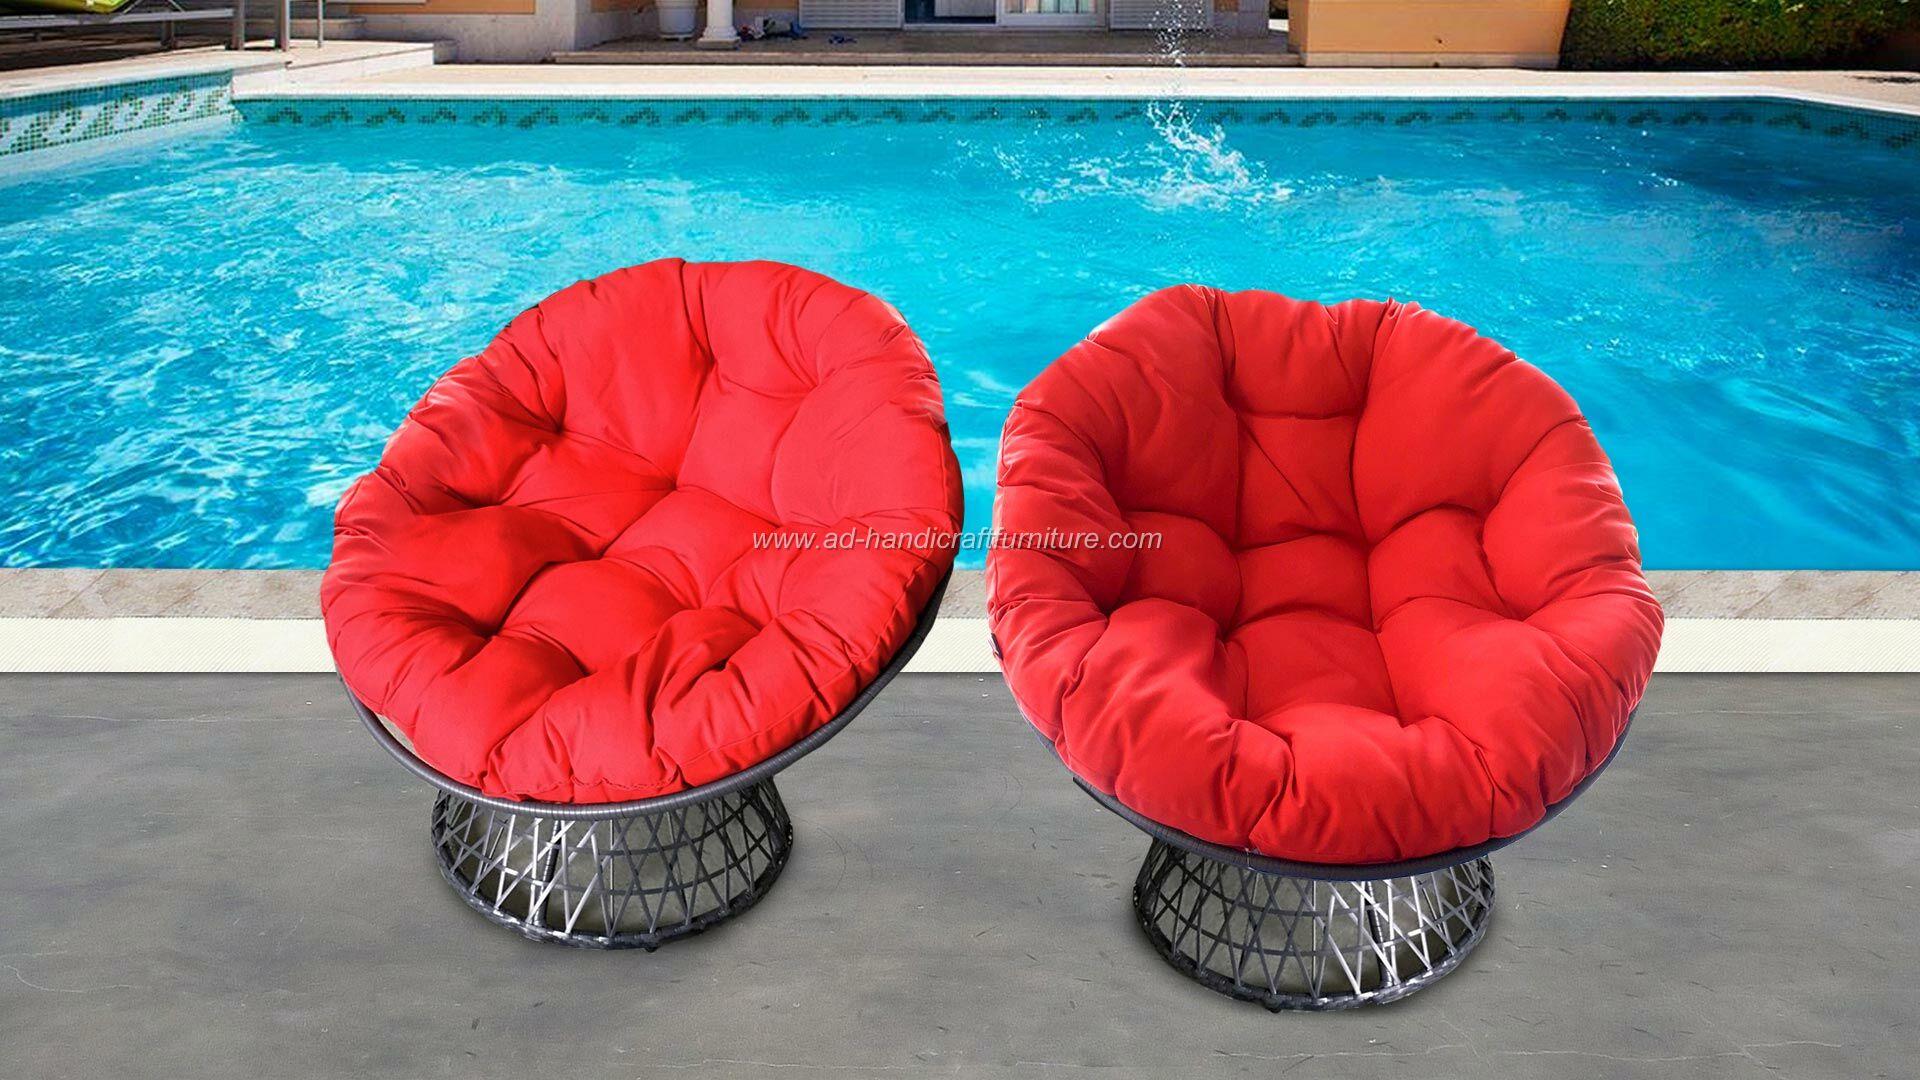 Poly rattan swivel chair with BIG cushion